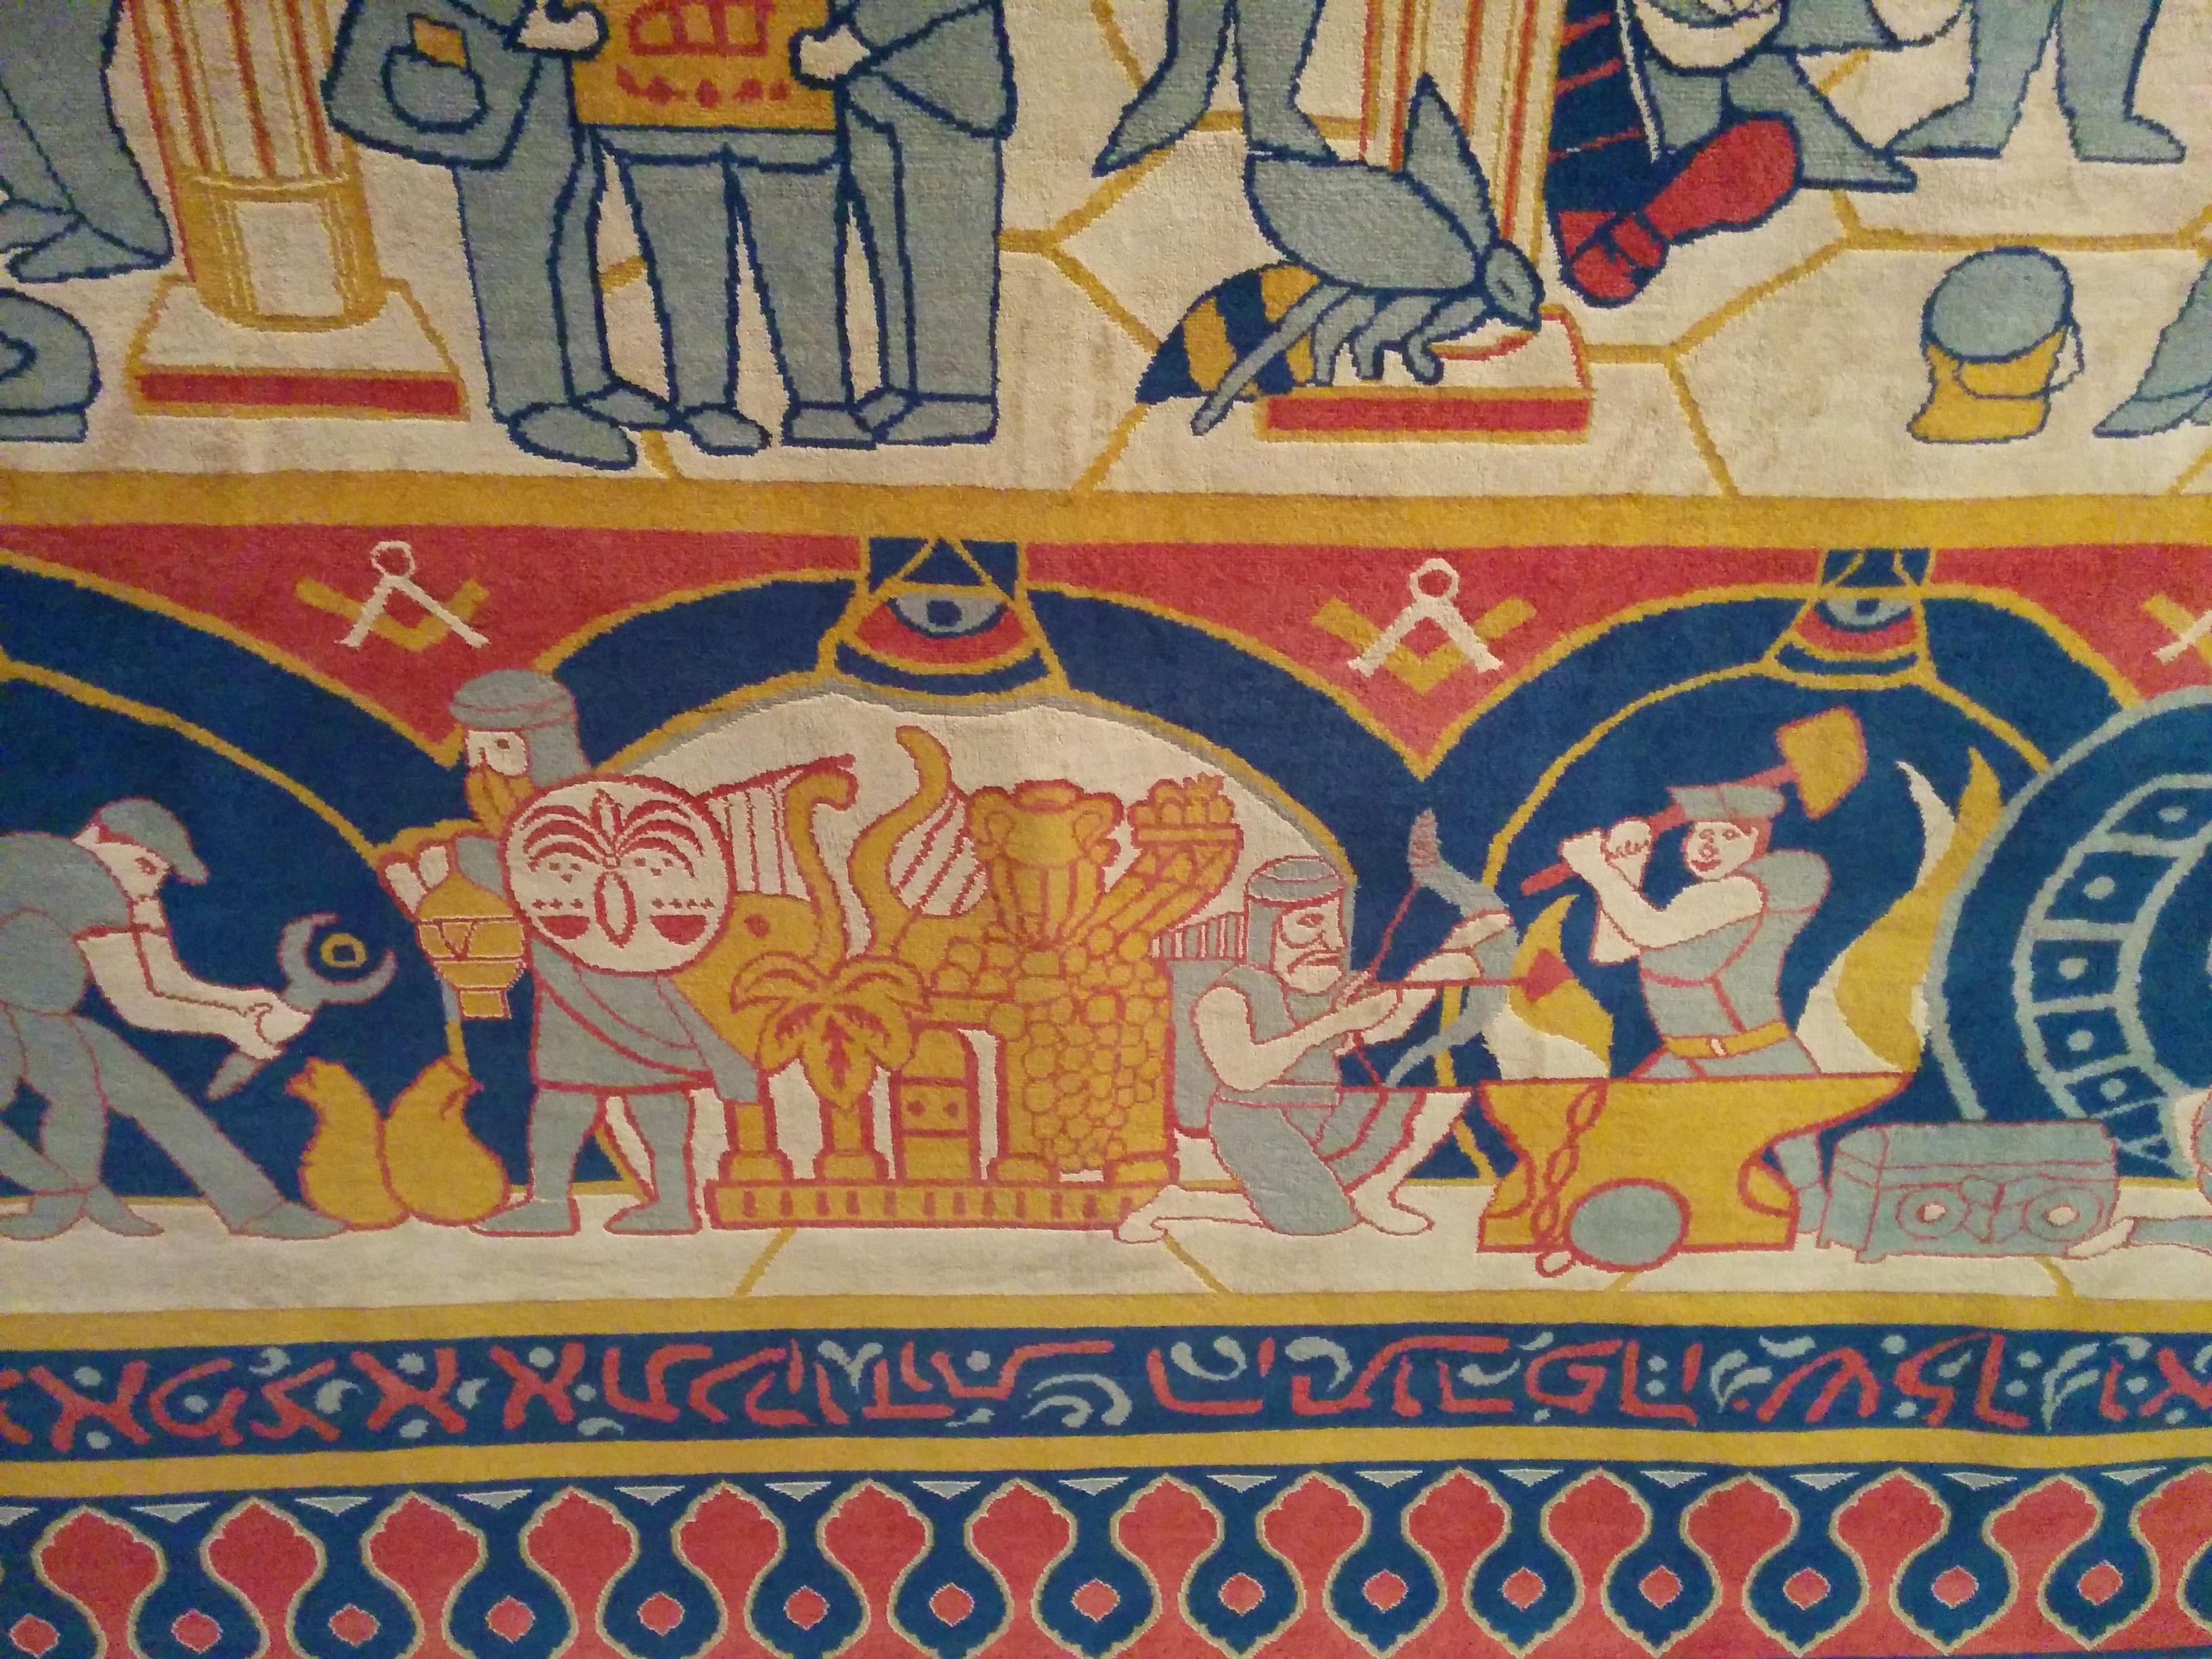 Bar Kokhba detail on Carpet - Shimon Bar Kokhba - Eretz Israel Museum